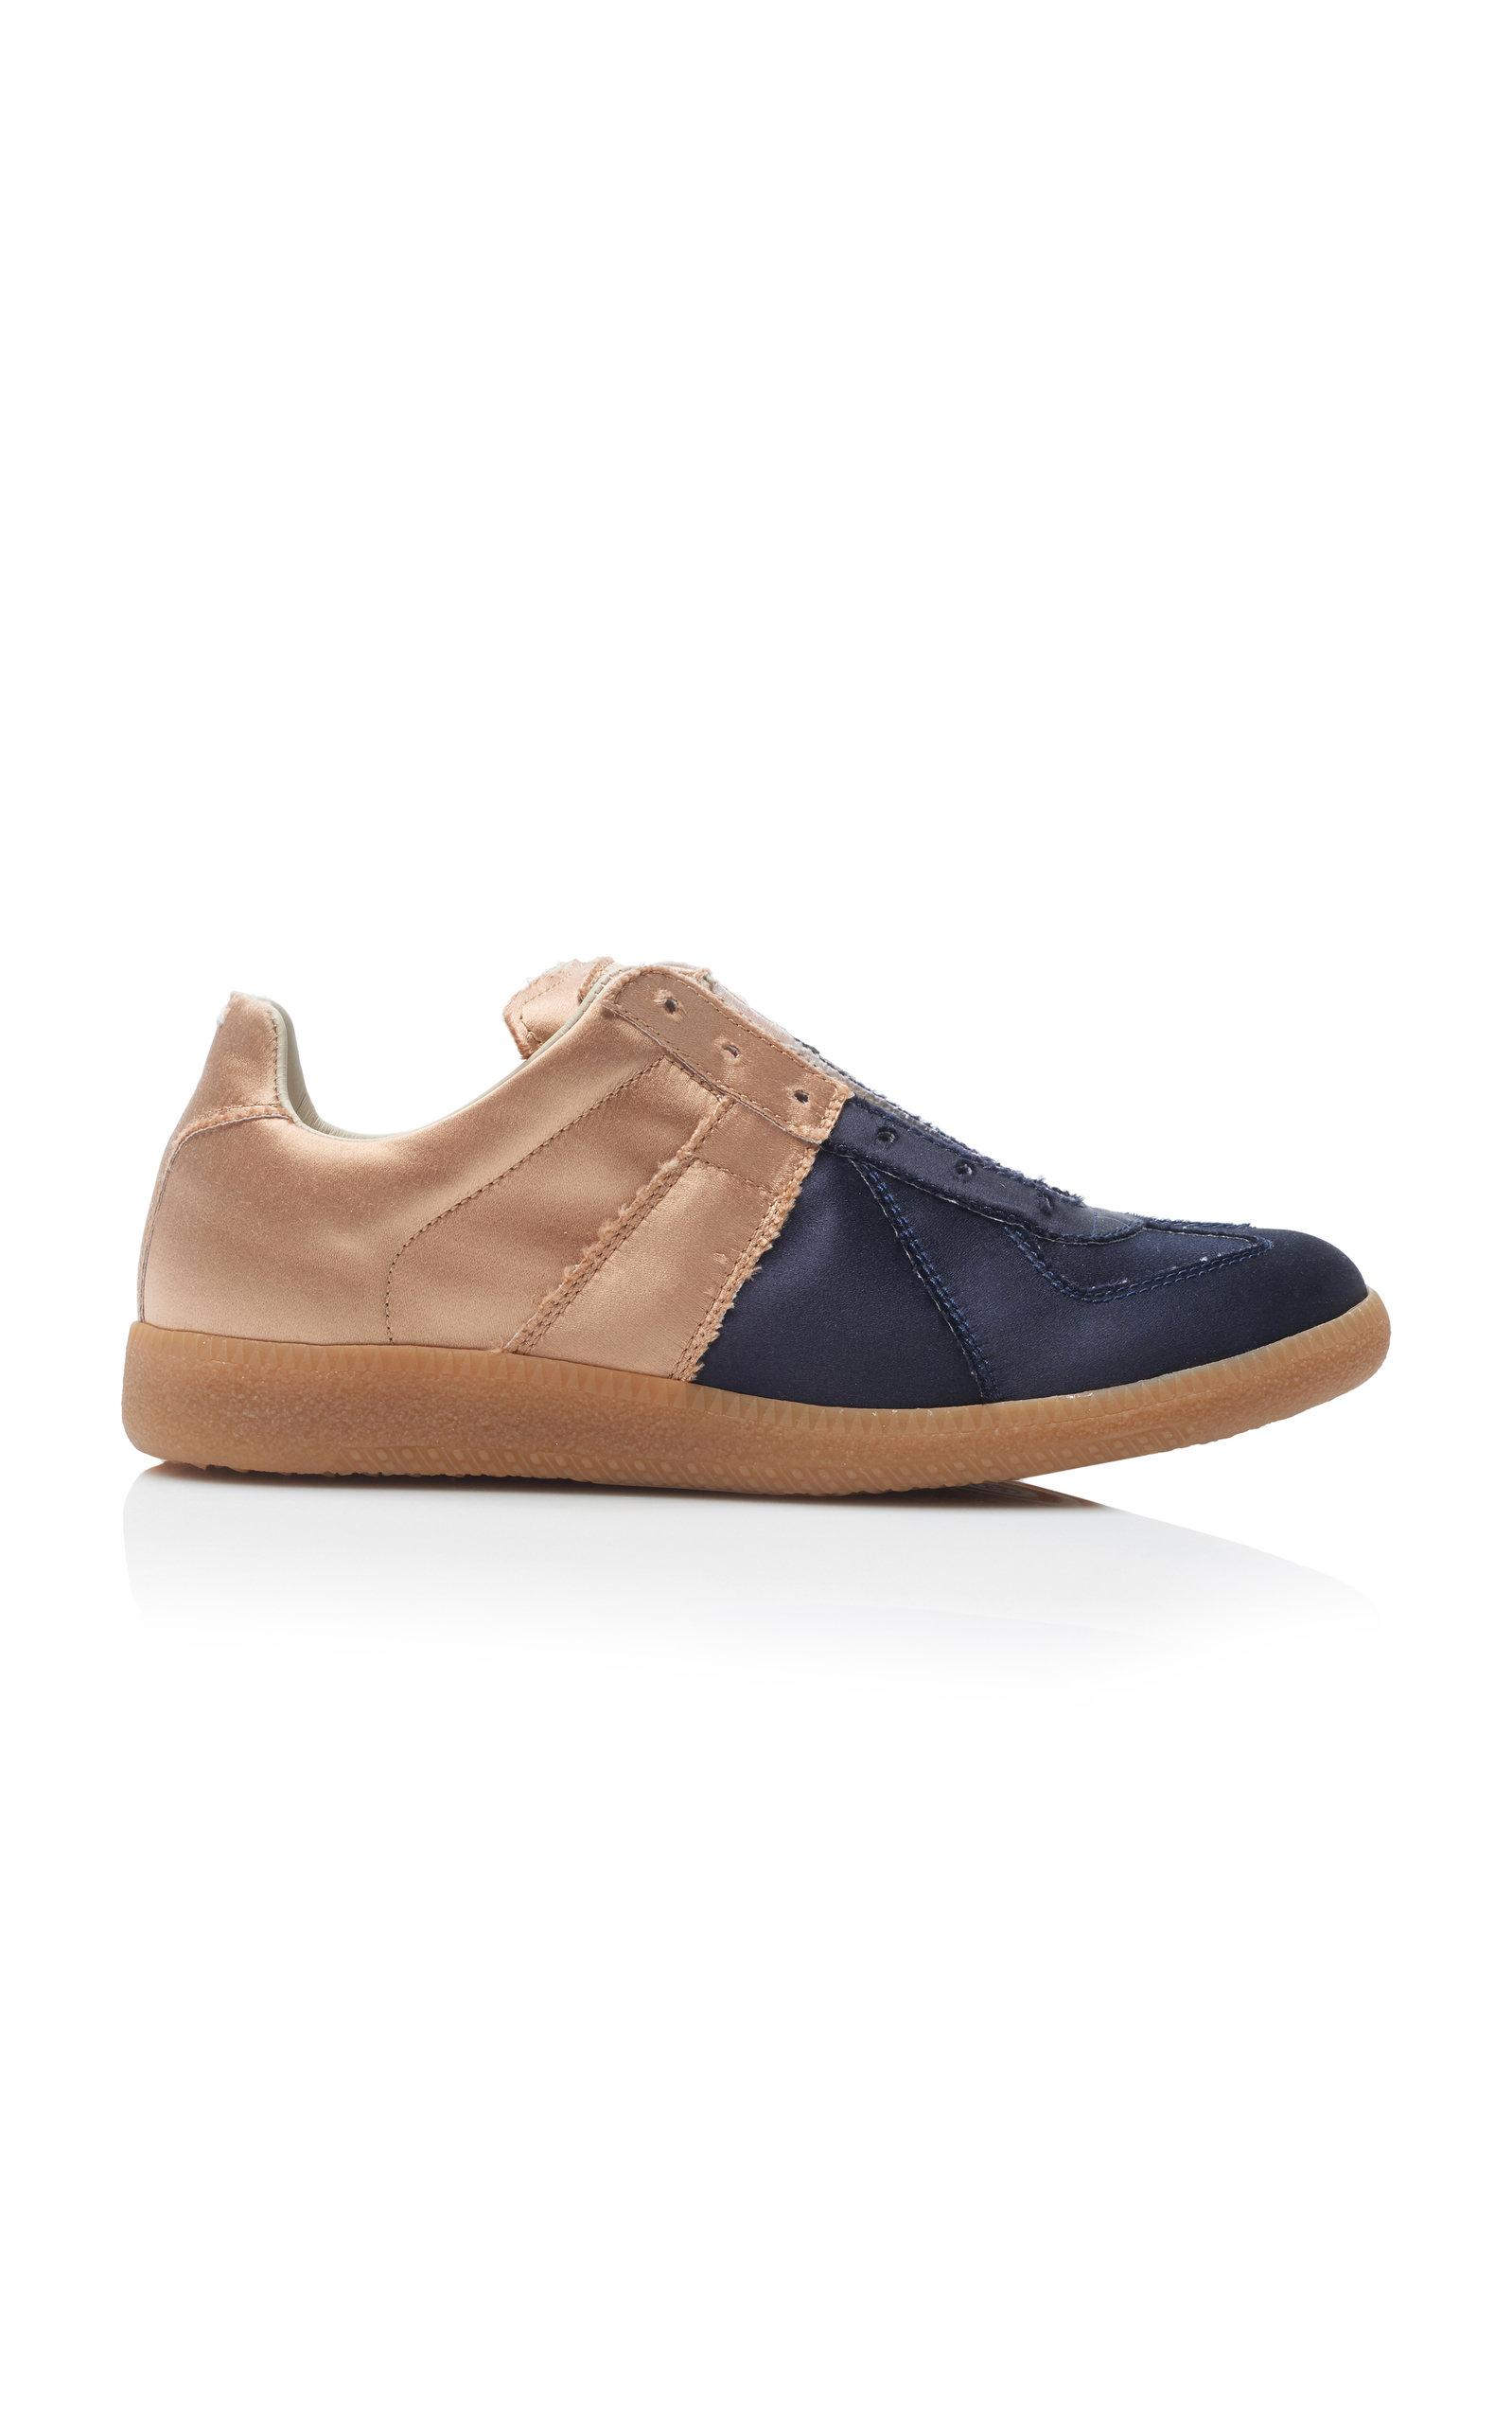 Maison Margiela Sneakers Two-Tone Satin Sneakers